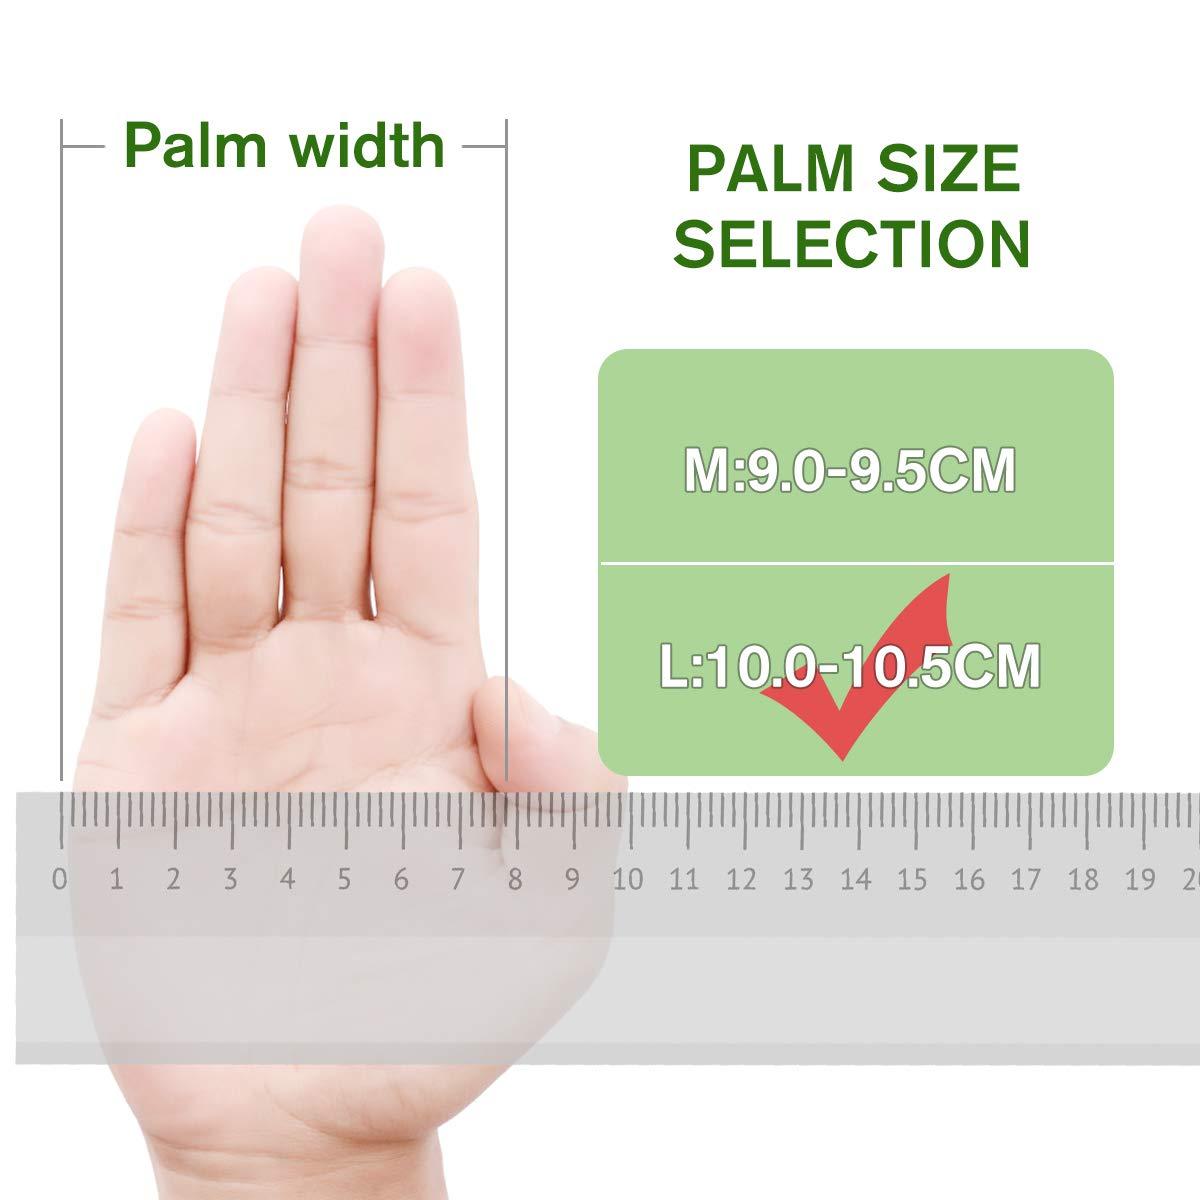 Bianco NASUM Mano Cubierta in Gomma PVC 100 PZ M Mano Cubierta Monouso,Micro Elastici Trasparenti Mano Cubierta